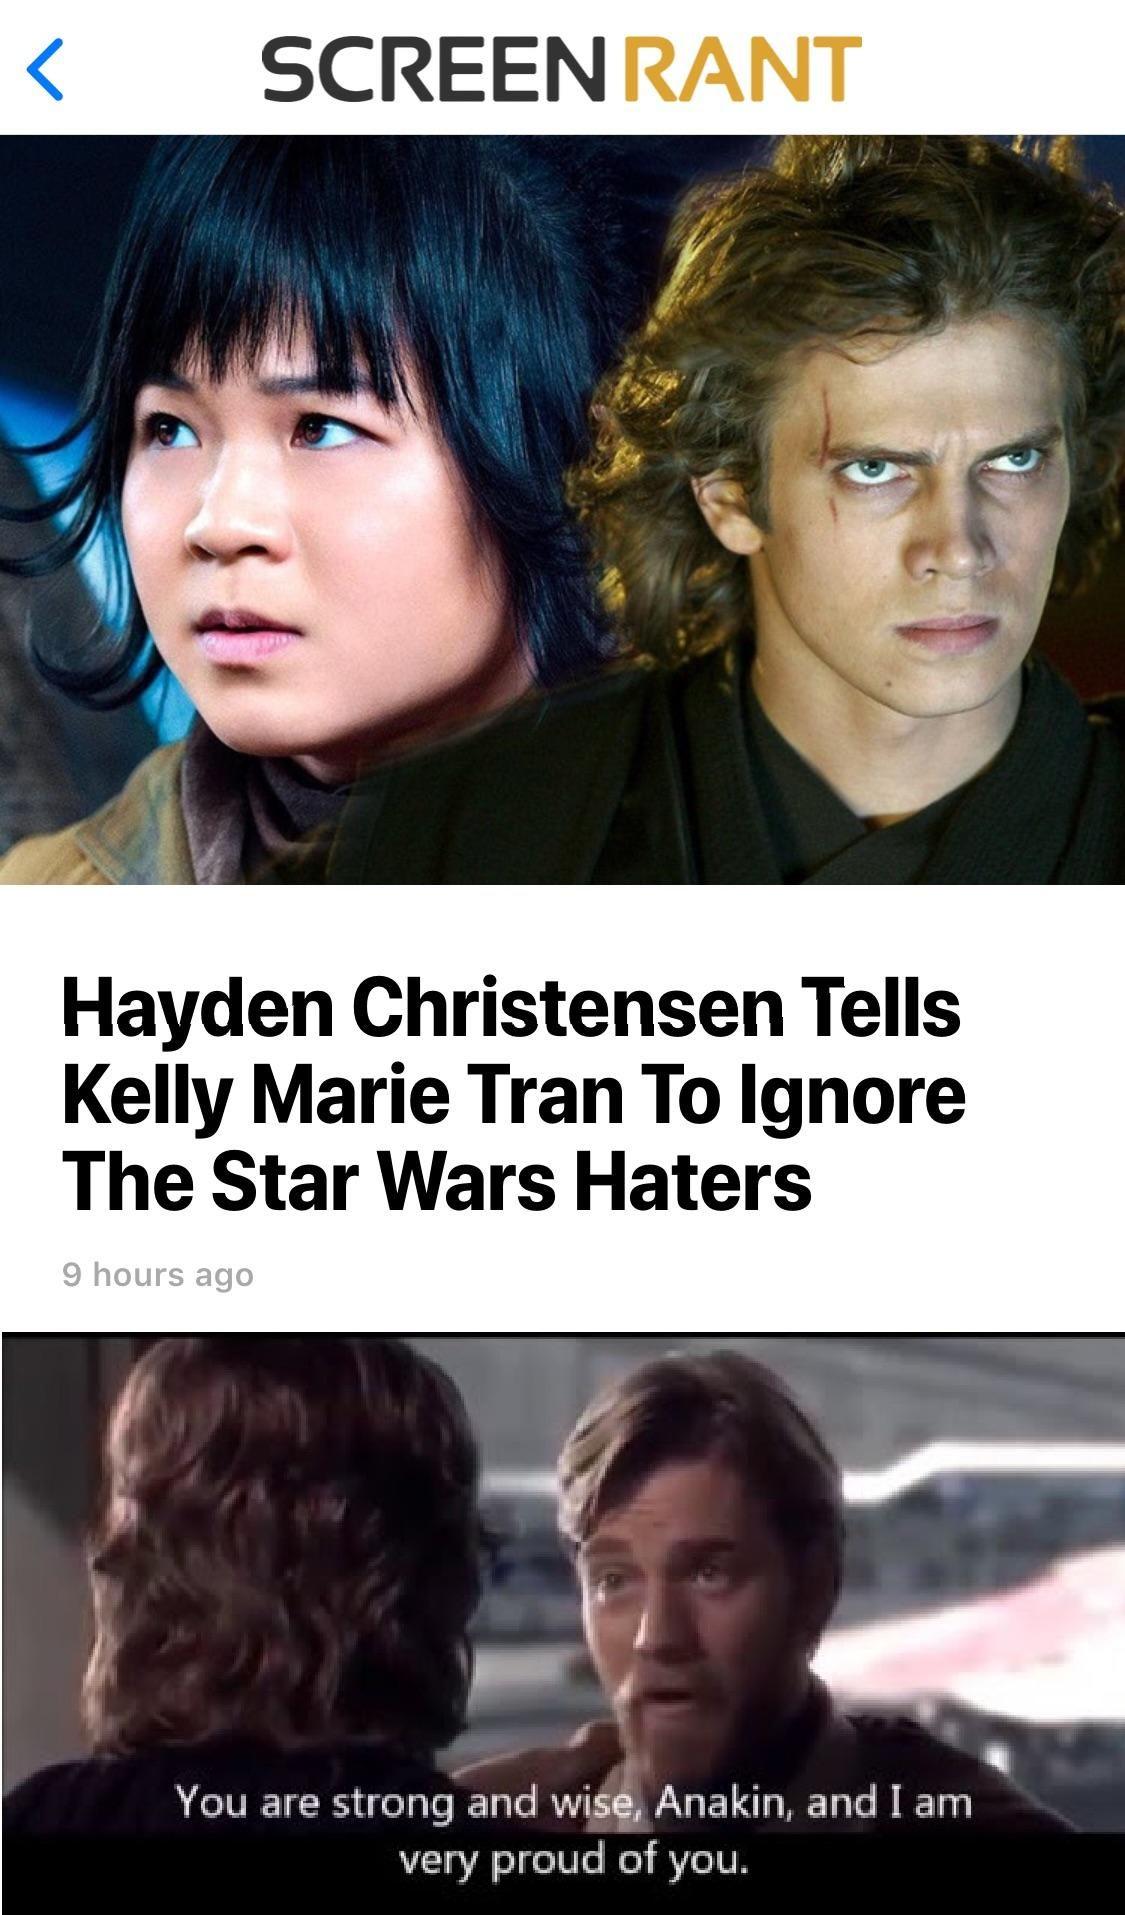 You Have Become A Far Greater Jedi Than I Could Ever Hope To Behttps I Redd It Vjrdnunj4bi11 Jpg Star Wars Memes Star Wars Humor Star Wars Jokes